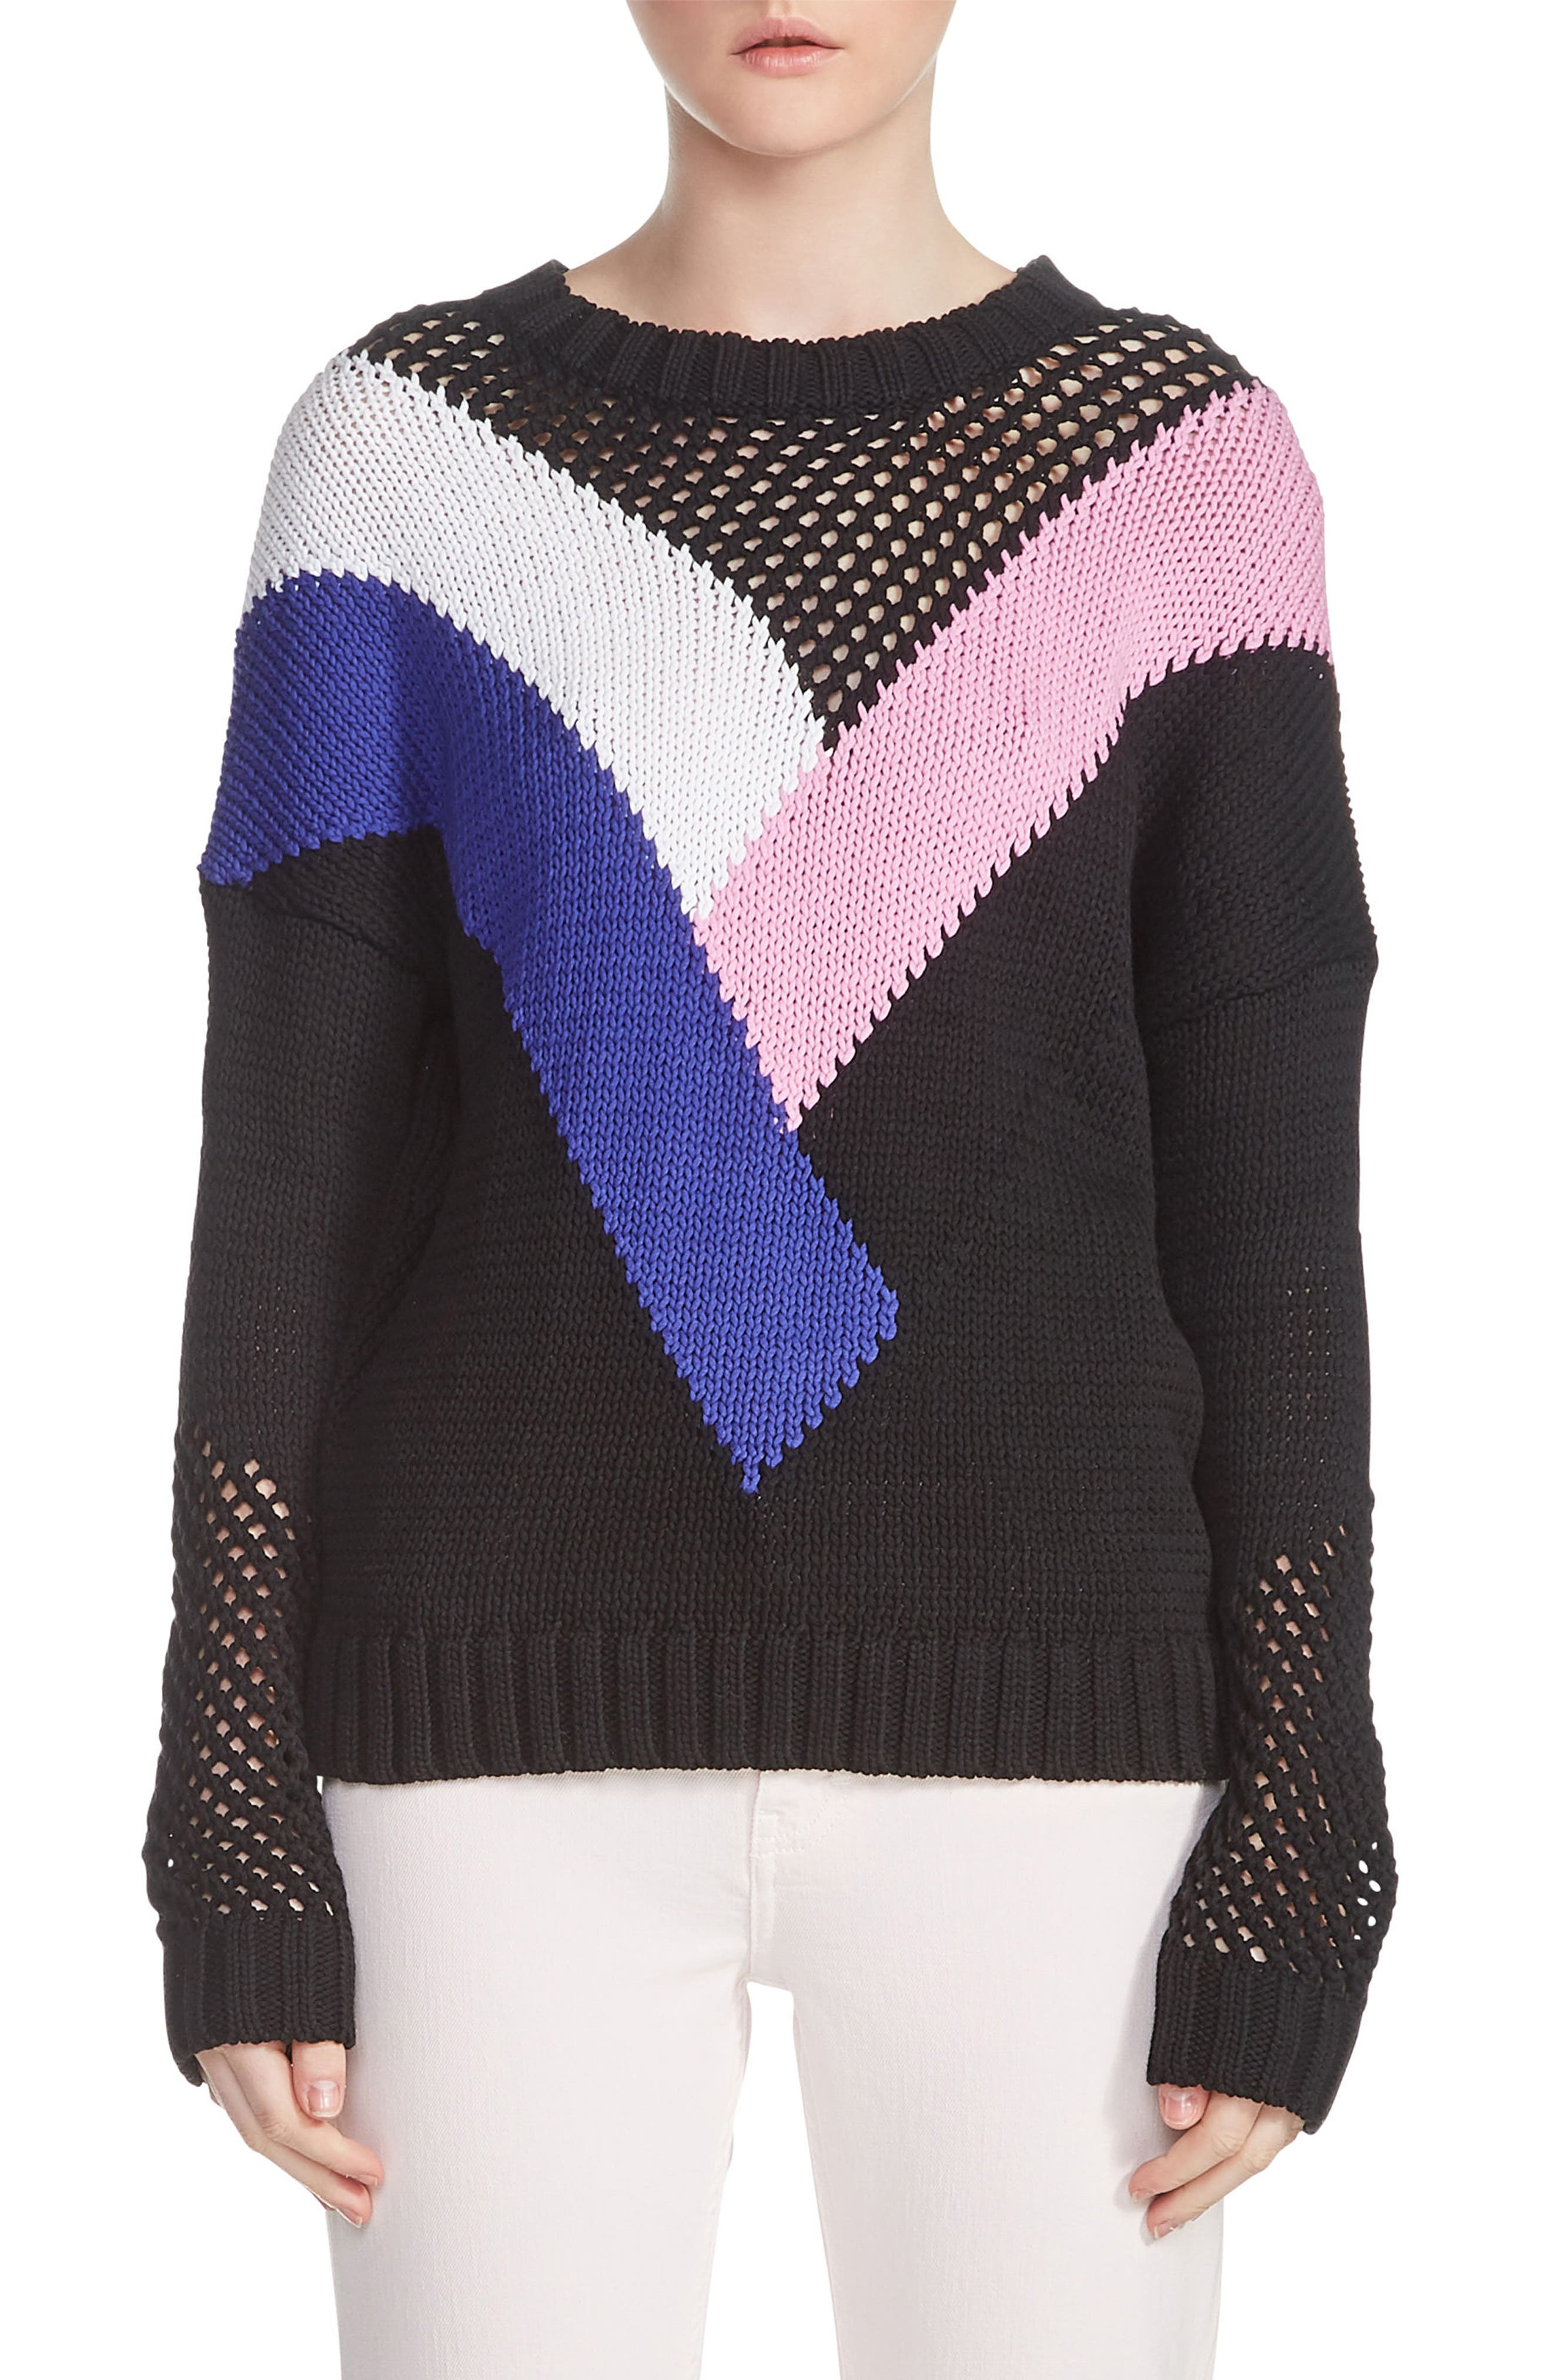 Marylene Sweater,                             Main thumbnail 1, color,                             001